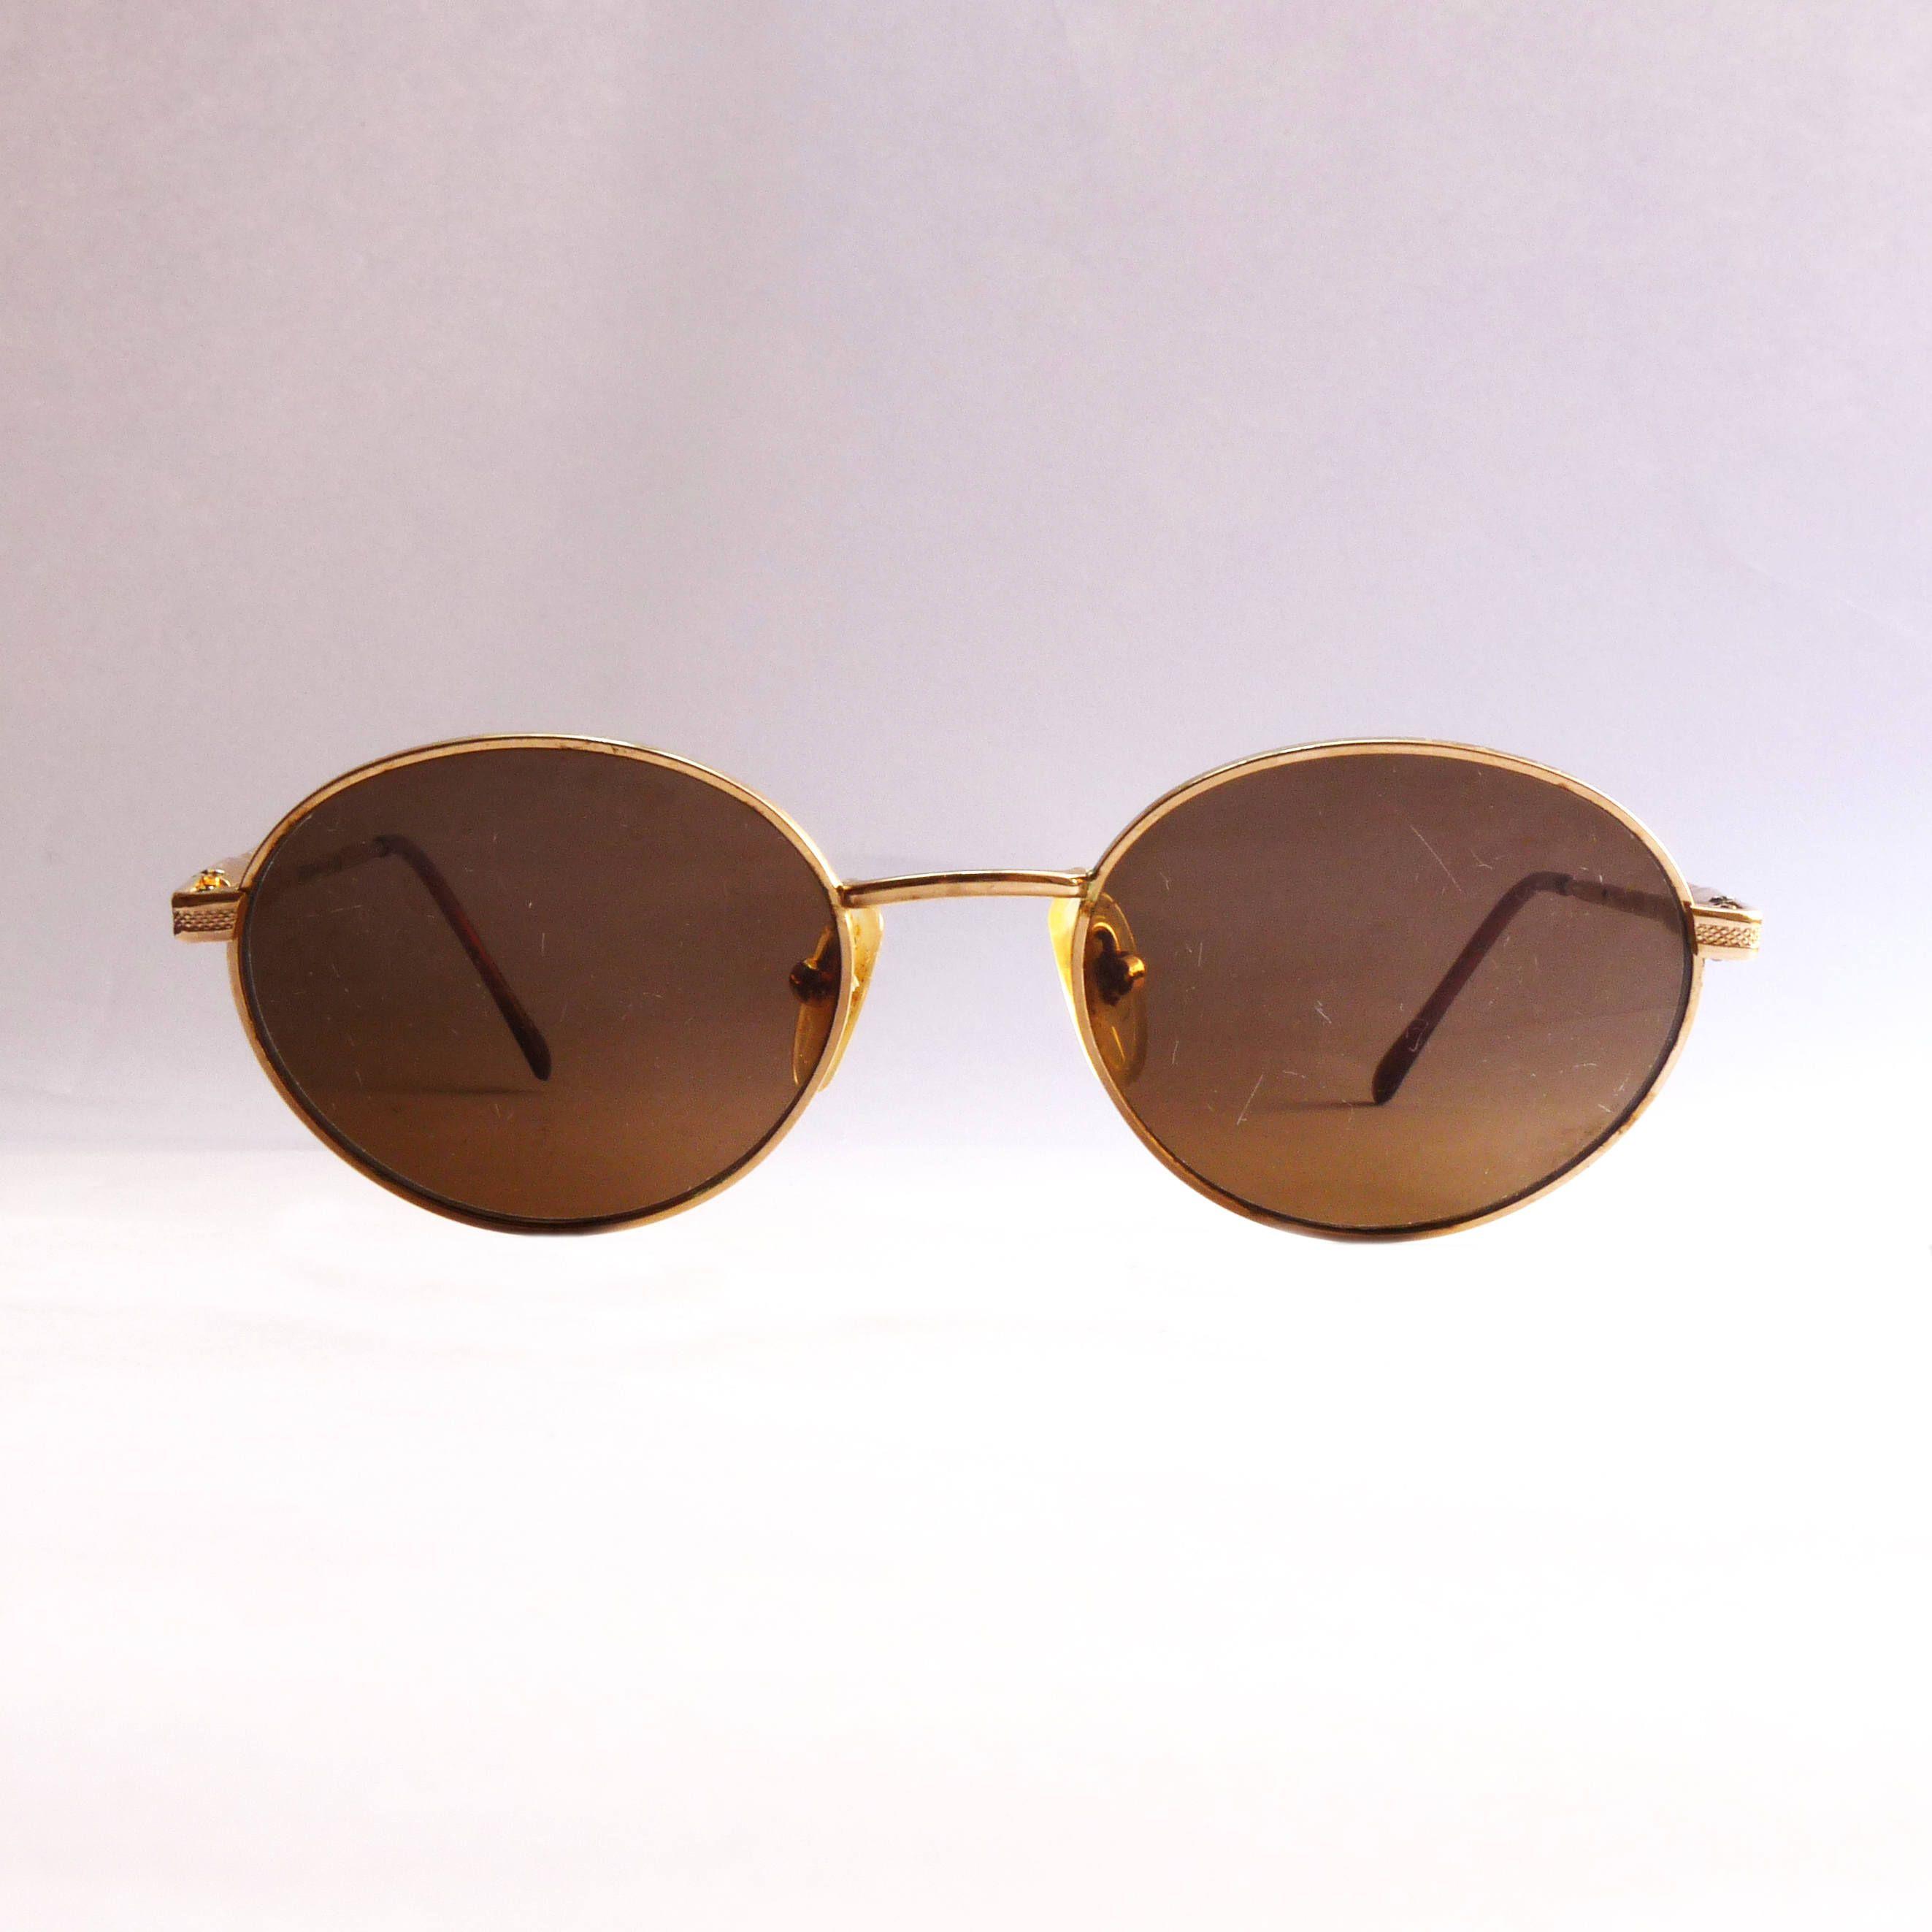 SFEROFLEX - vintage sunglasses - men sunglasses - women sunglasses ...